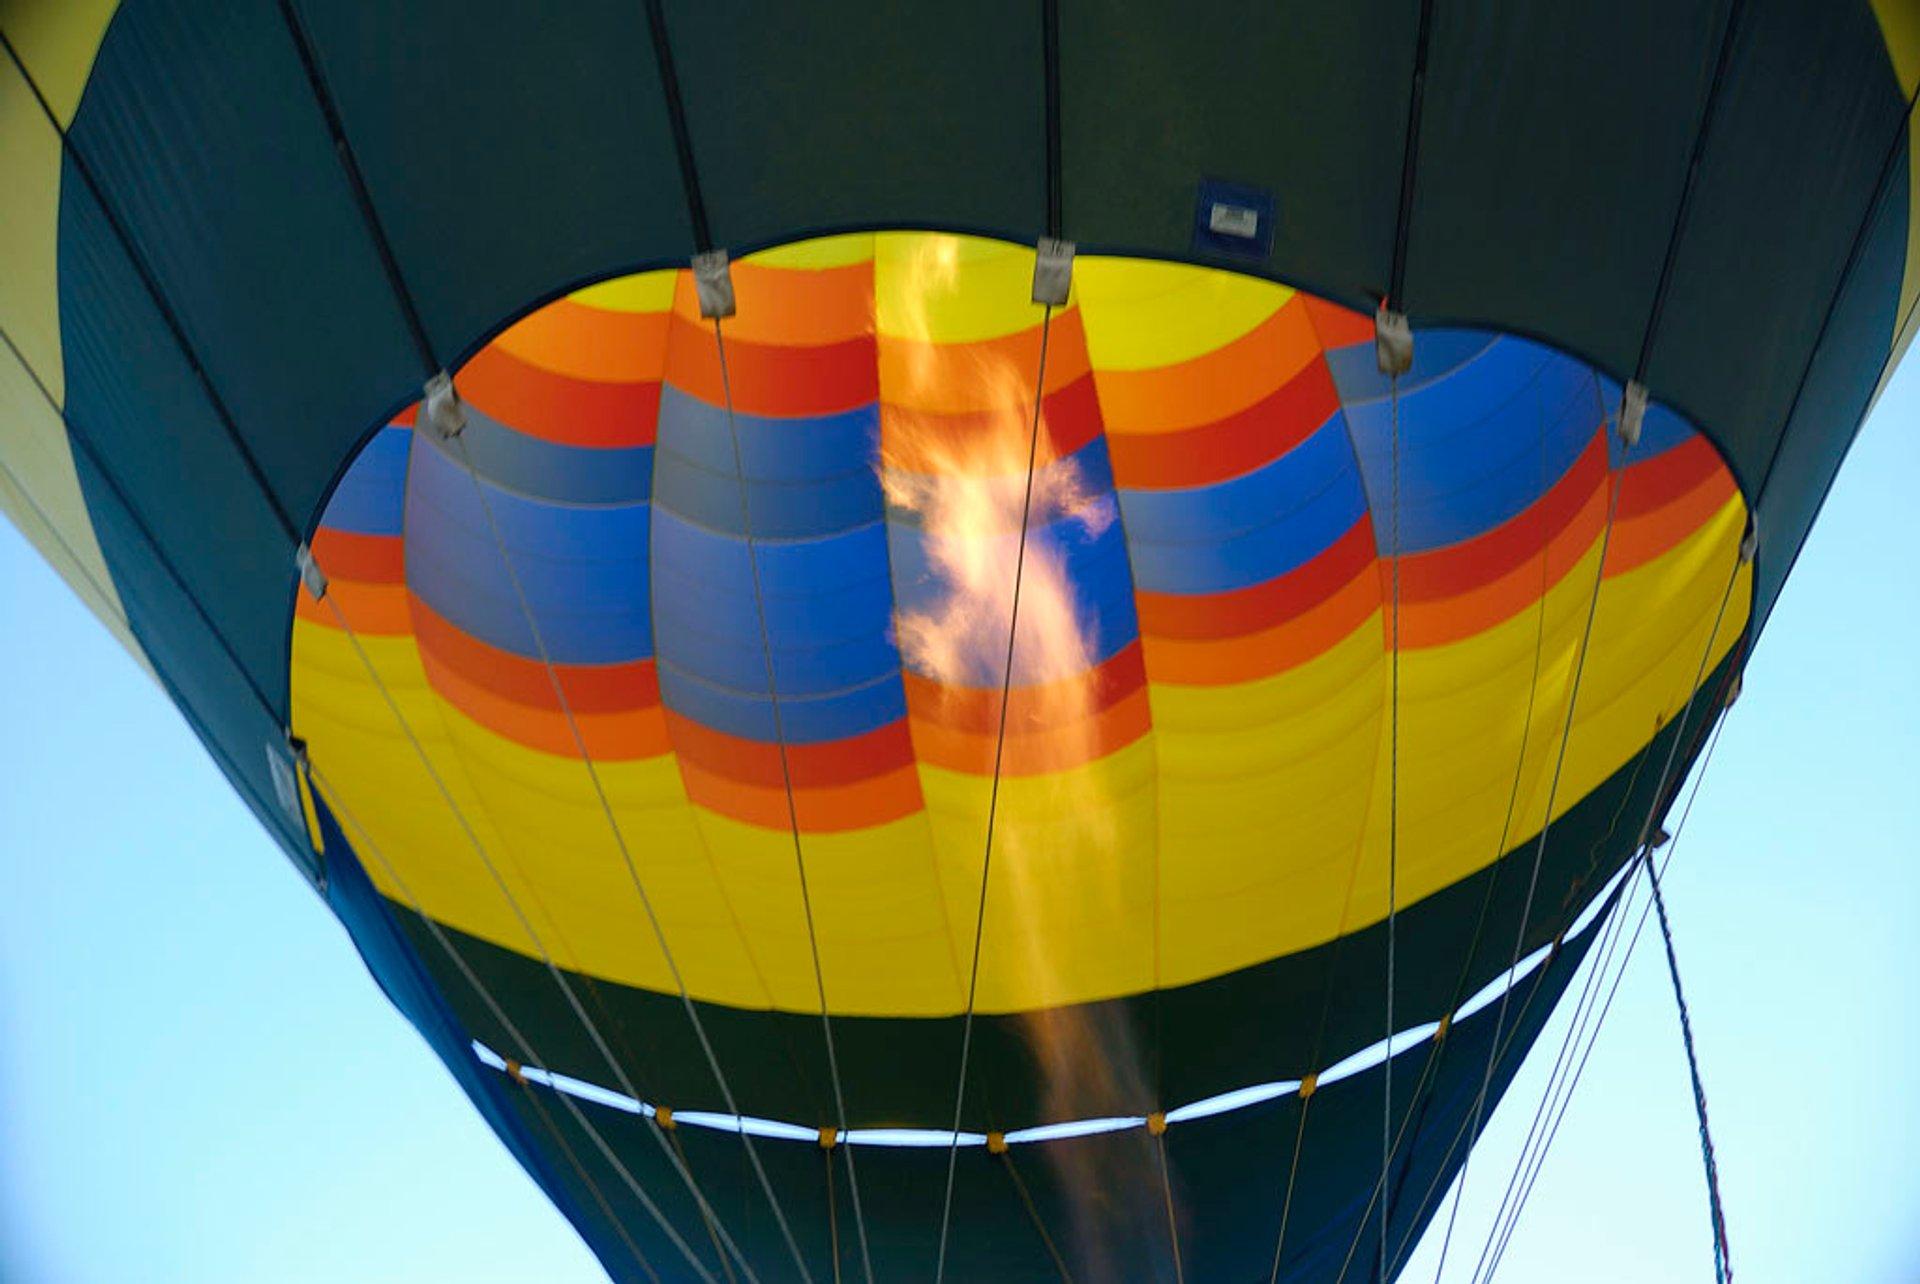 Temecula Valley Balloon & Wine Festival in California - Best Season 2020